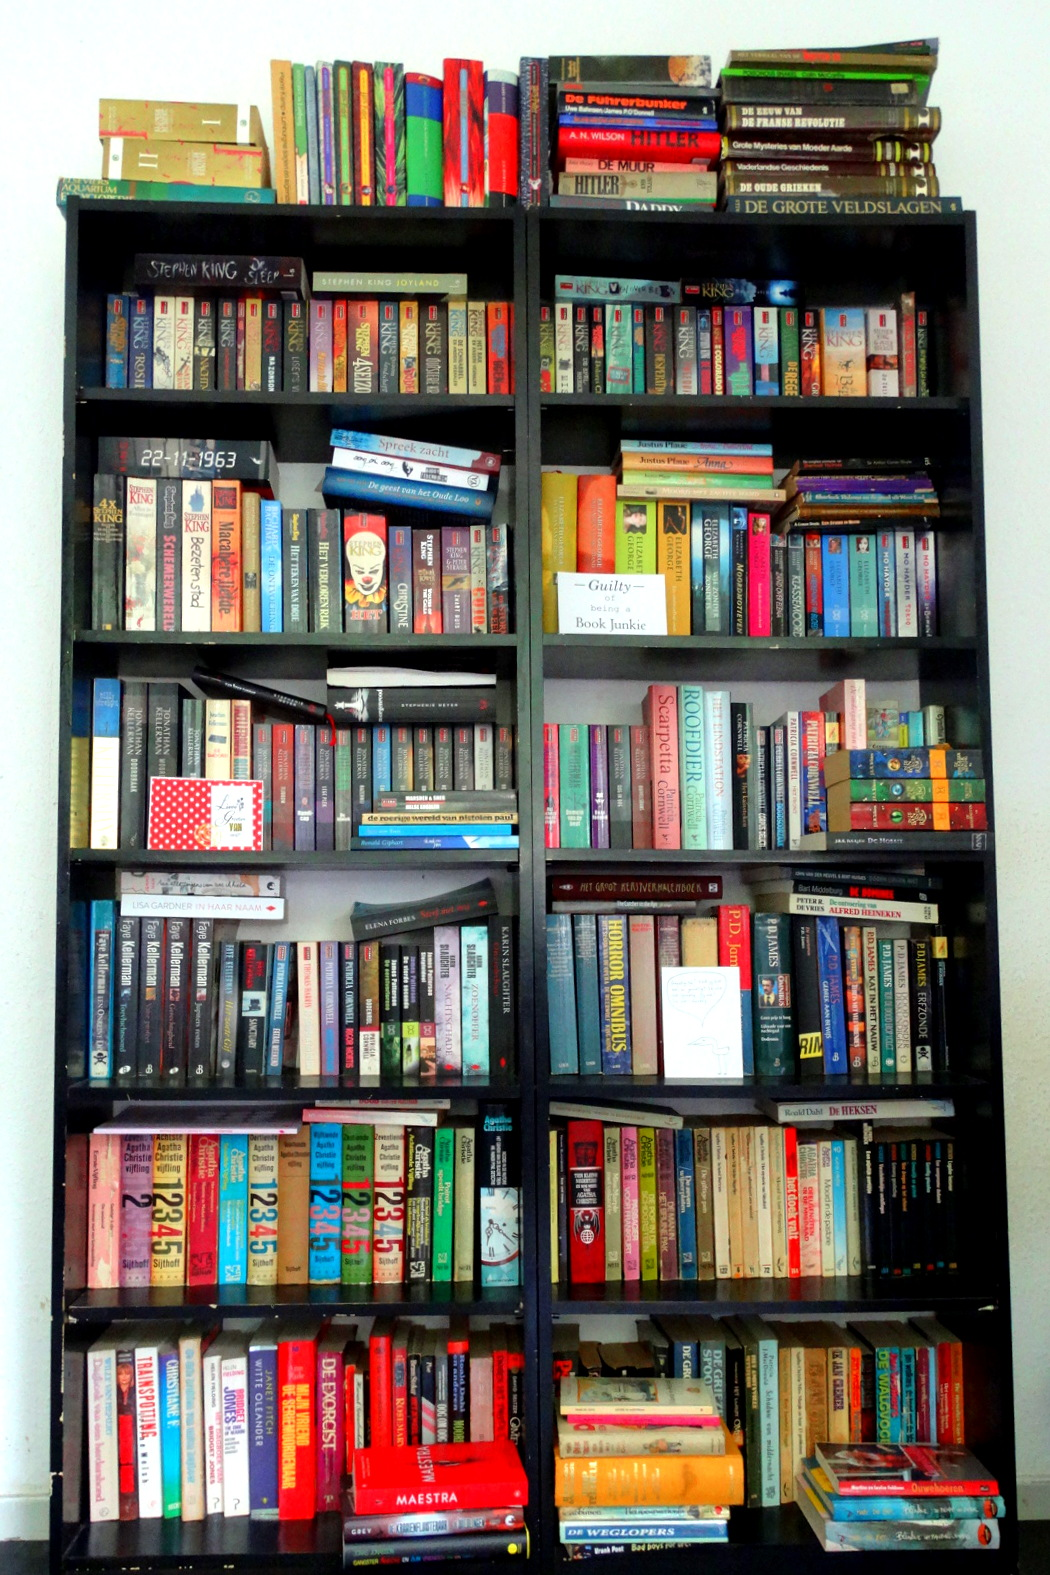 bv-tamara-boekenkast